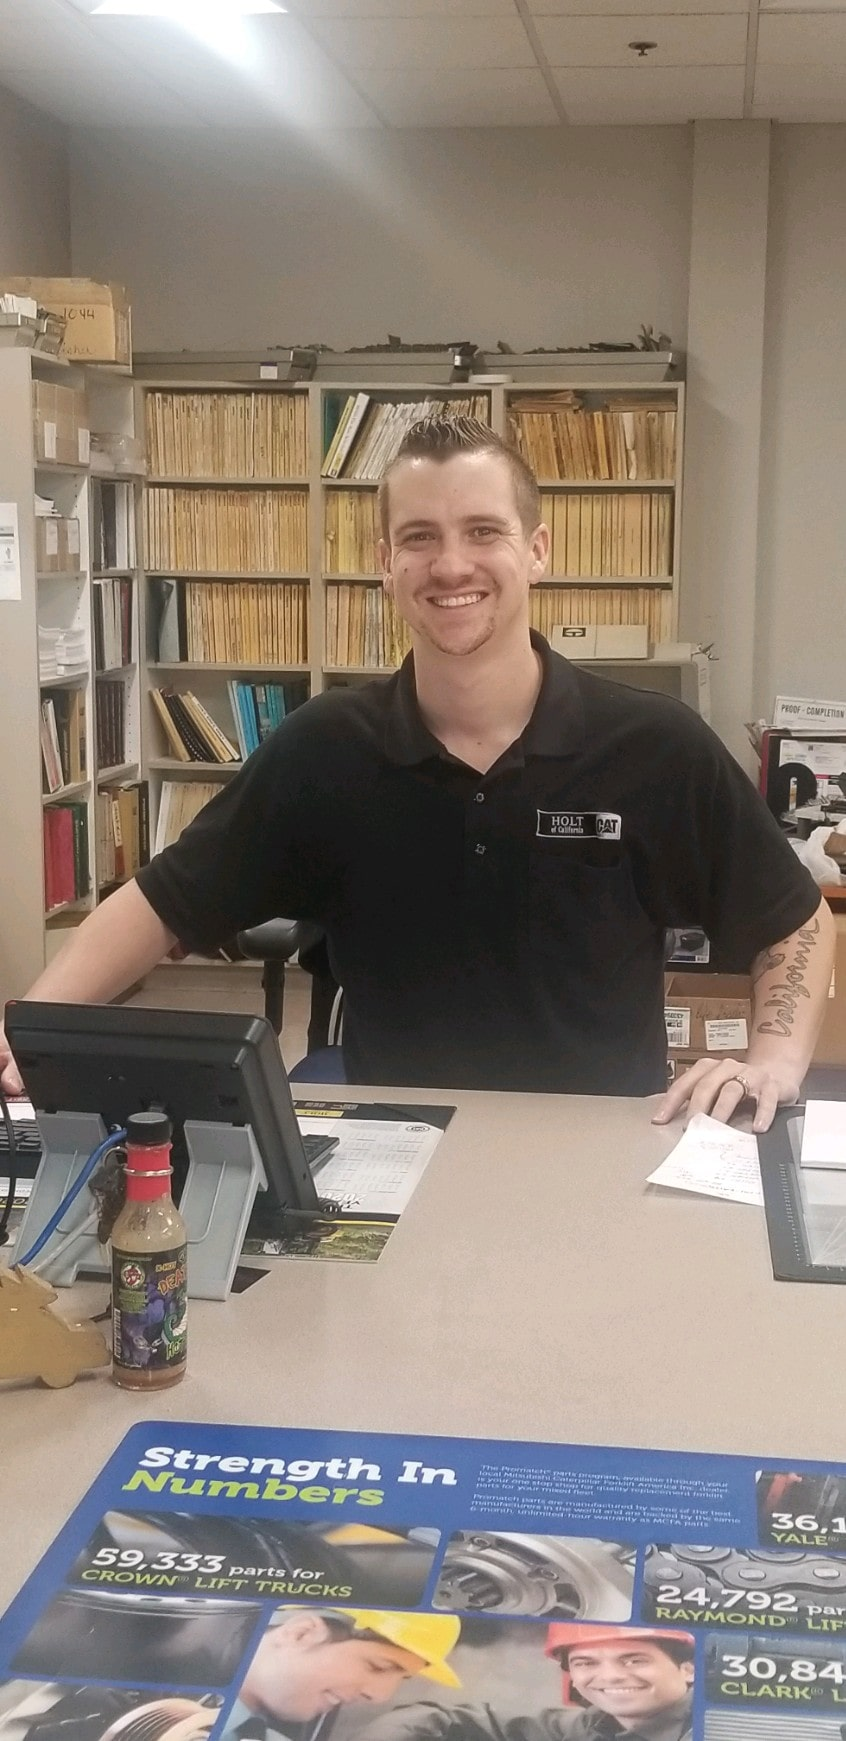 Sam Post smiling behind a computer